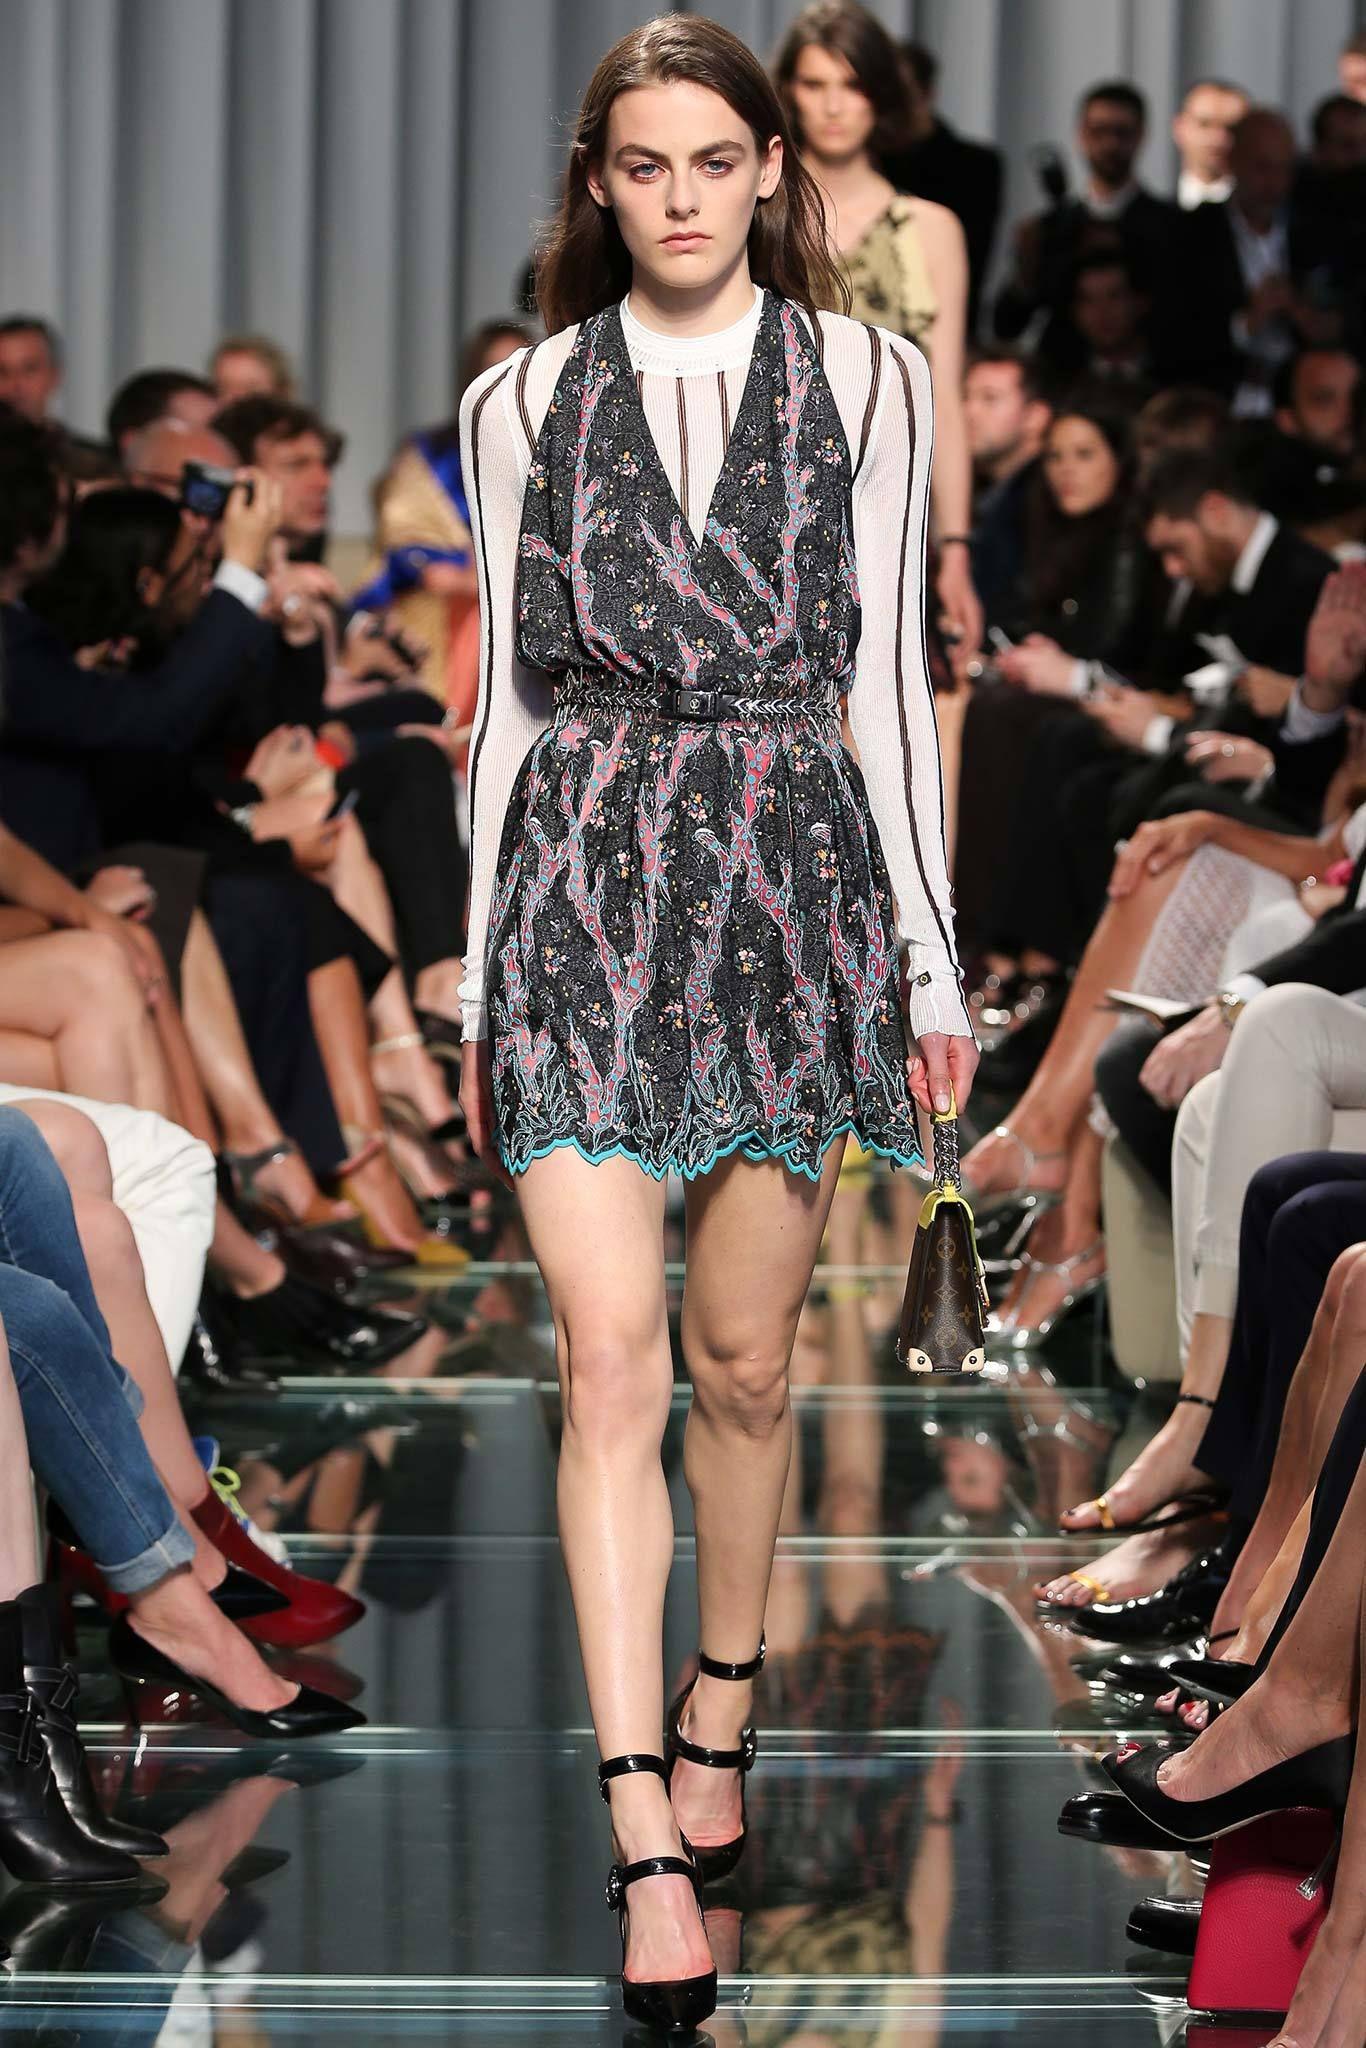 Louis Vuitton resort 2015 collection. See more: #LouisVuittonAtFip, #FashionInPics